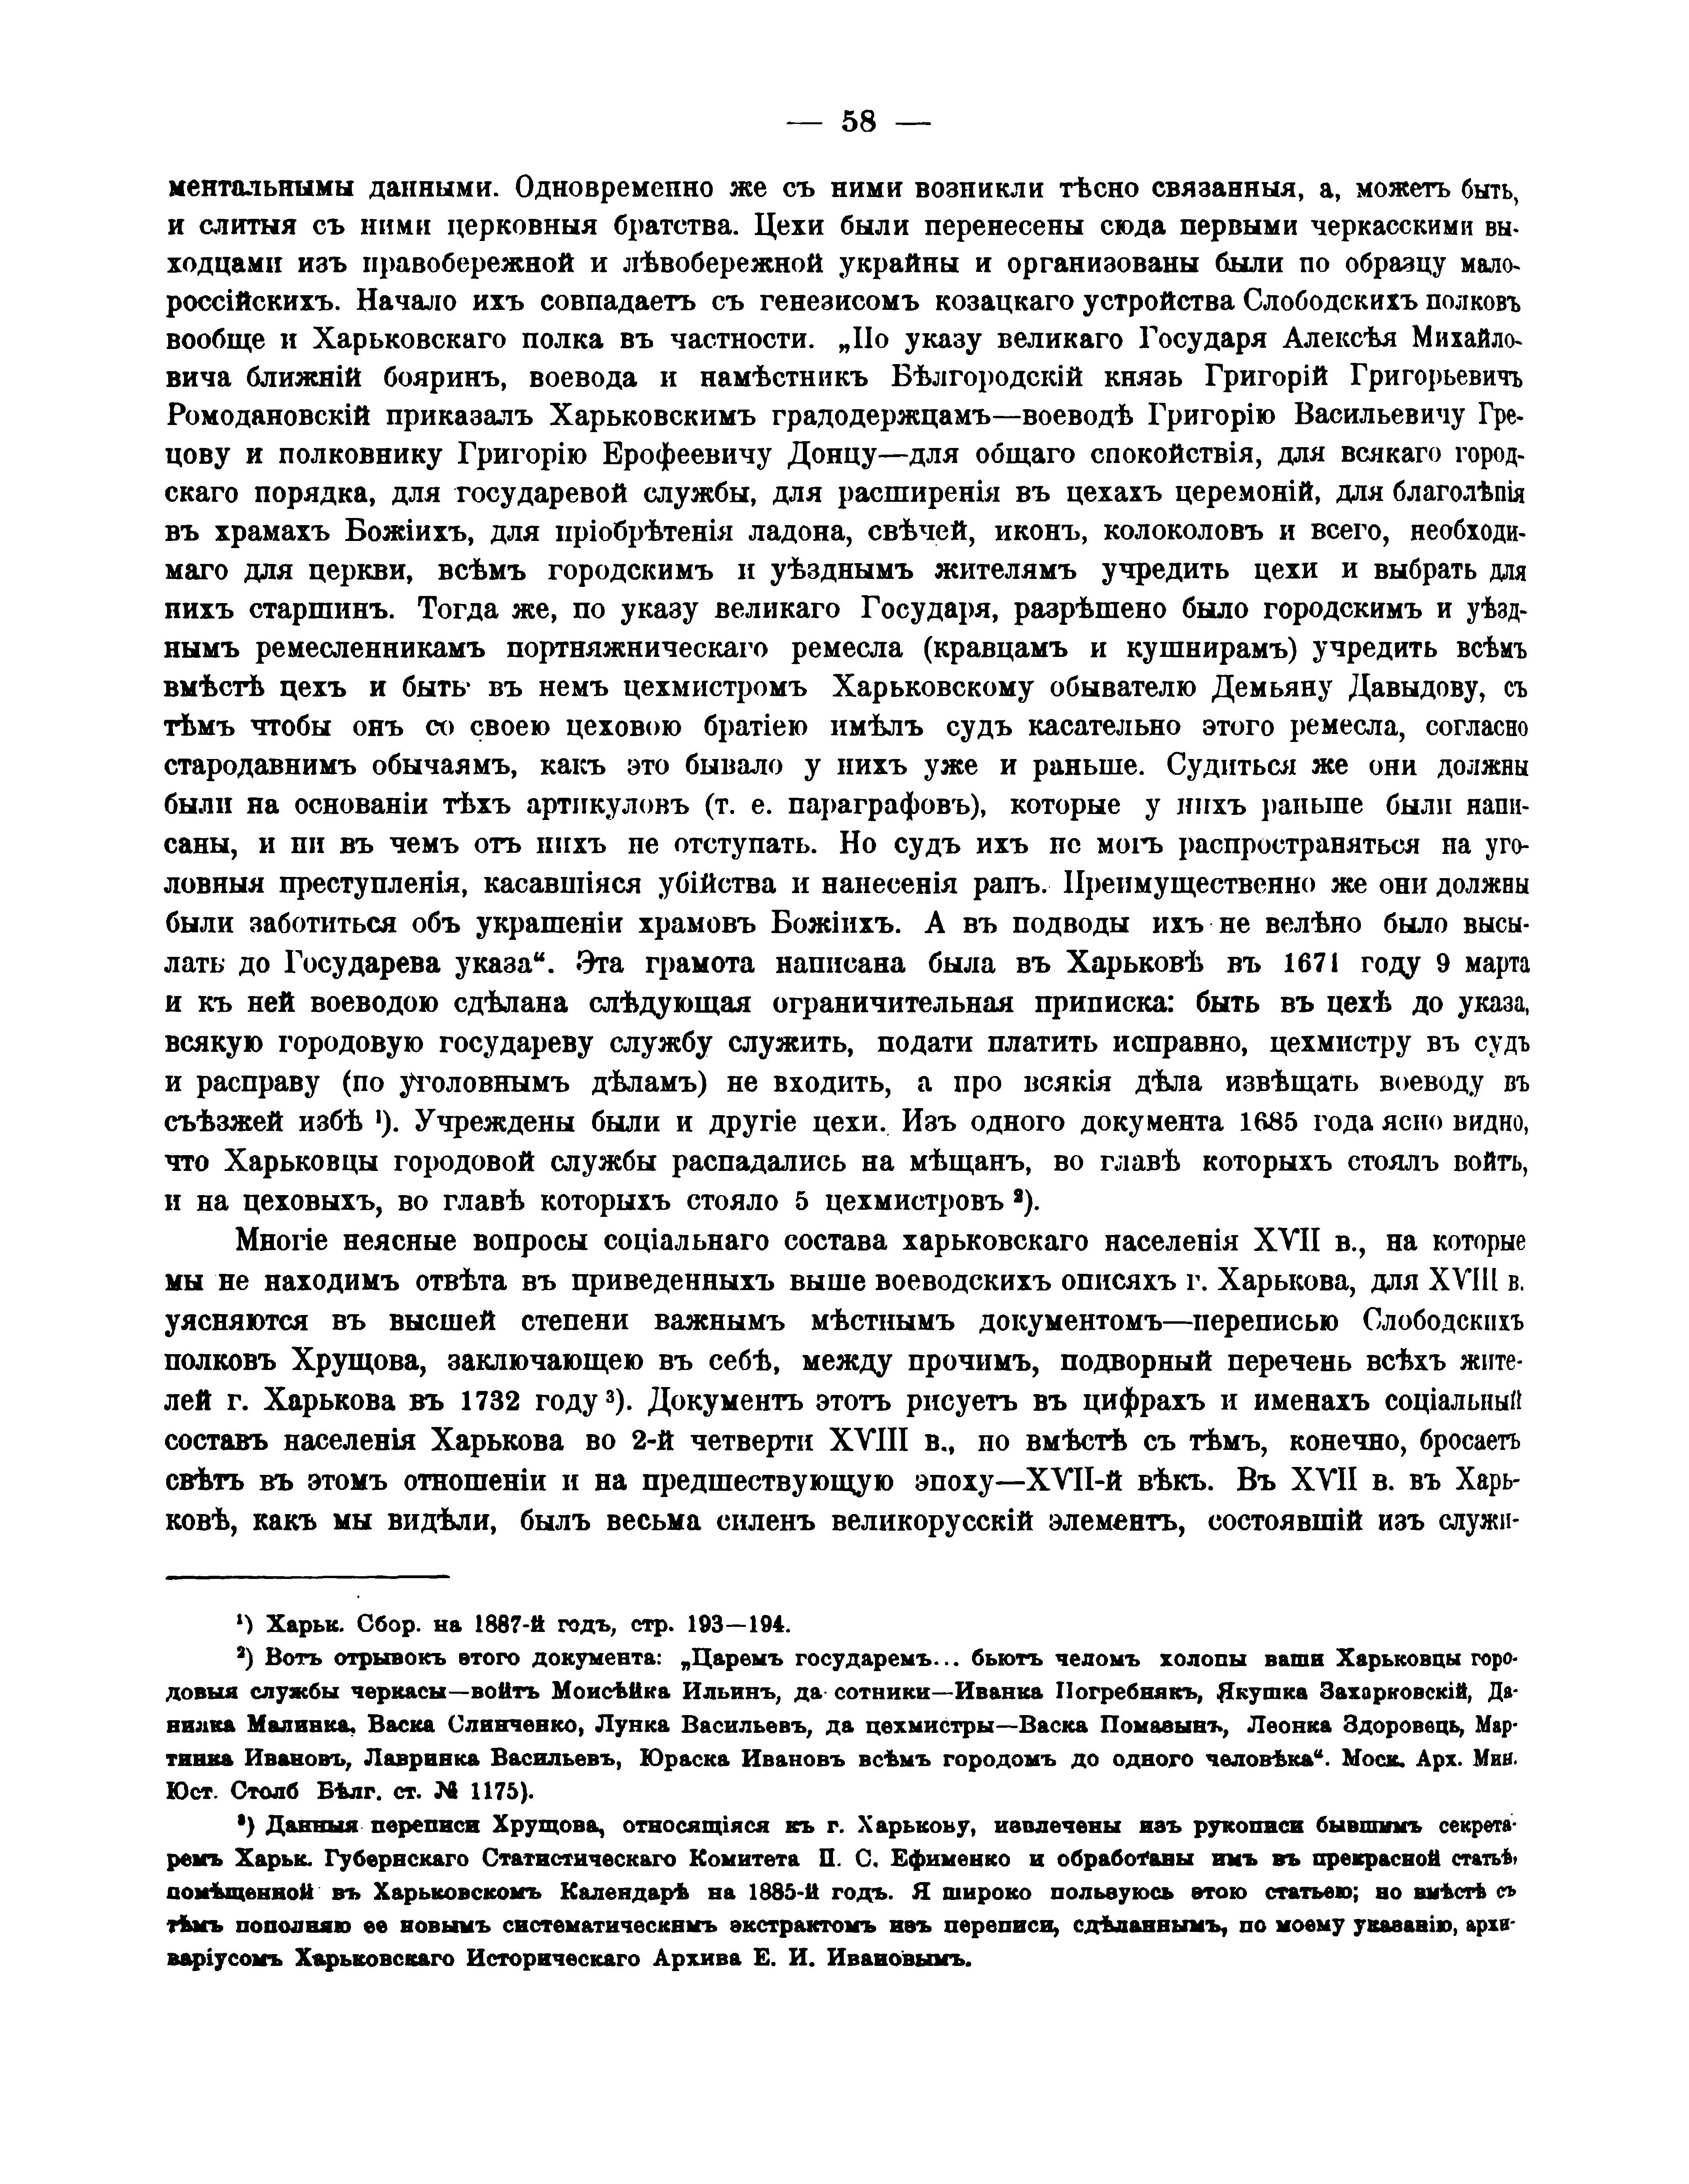 Приказ моск 213.